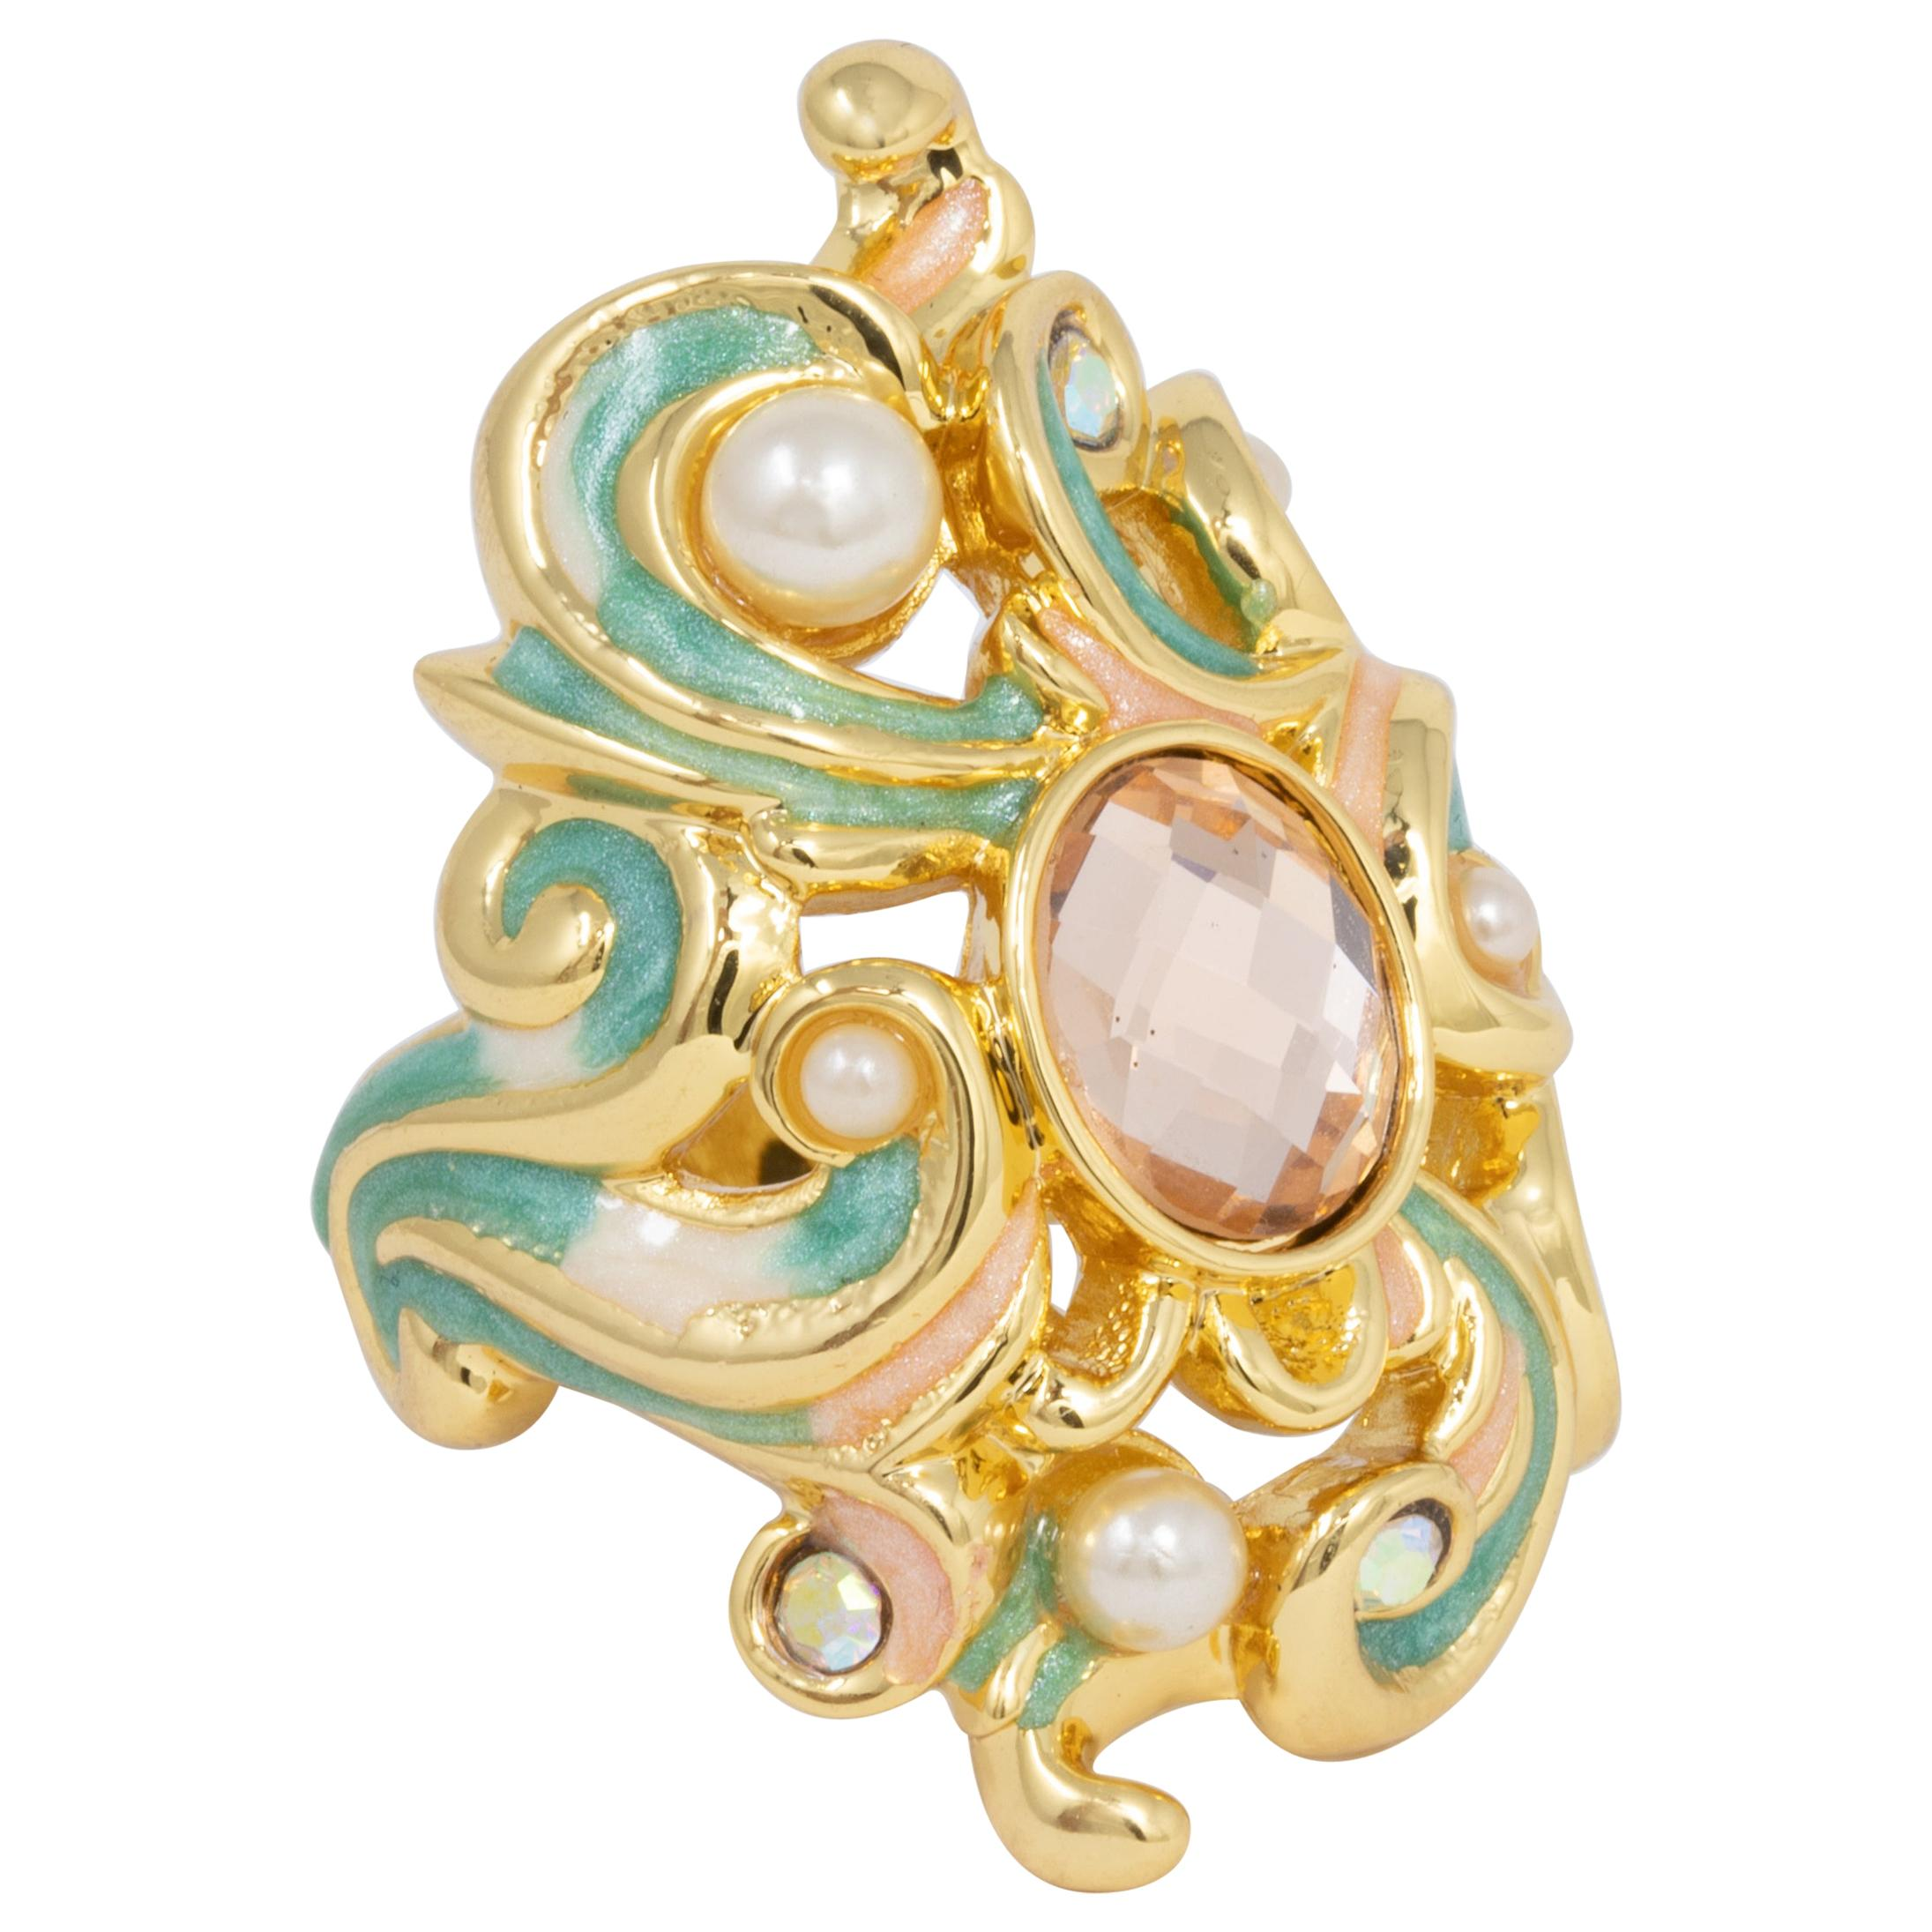 Diamond Cut Mushroom Circle Ring 14K Yellow Gold HSN